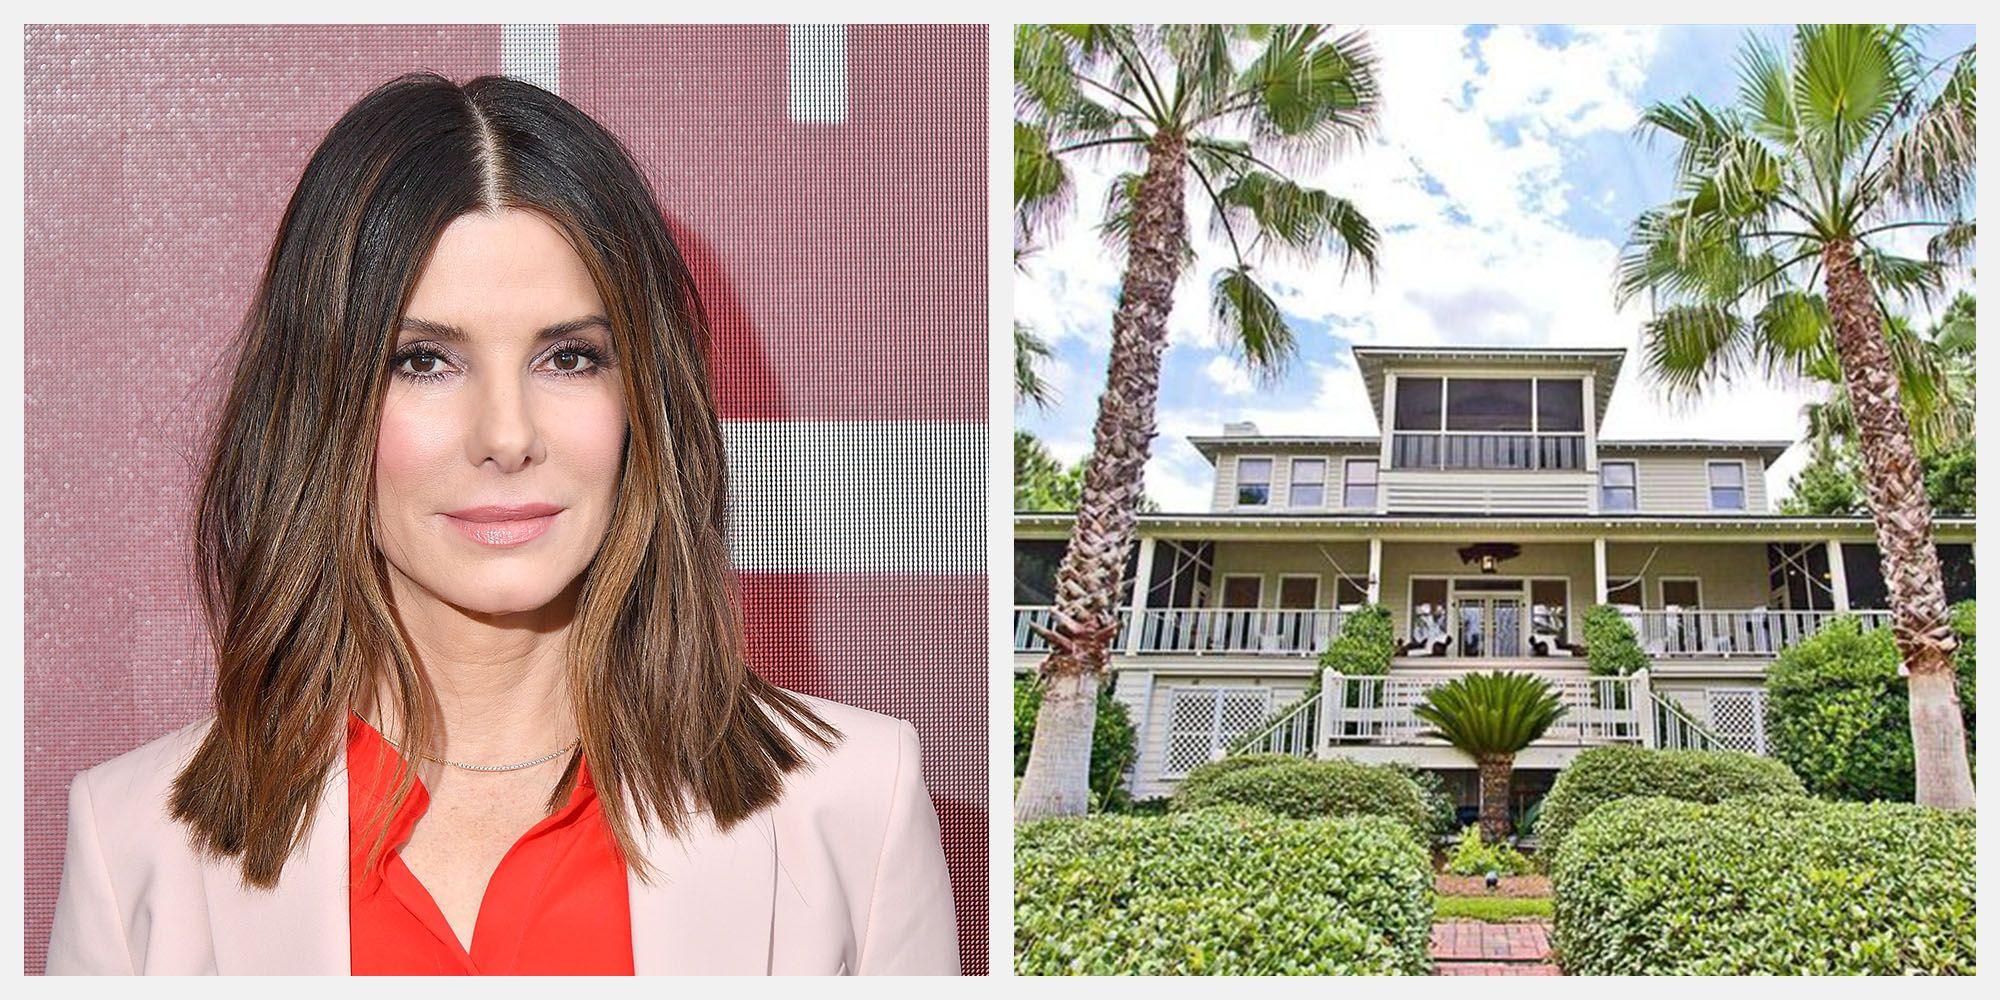 Sandra Bullock Is Selling Her Georgia Beach House for $6.5 Million